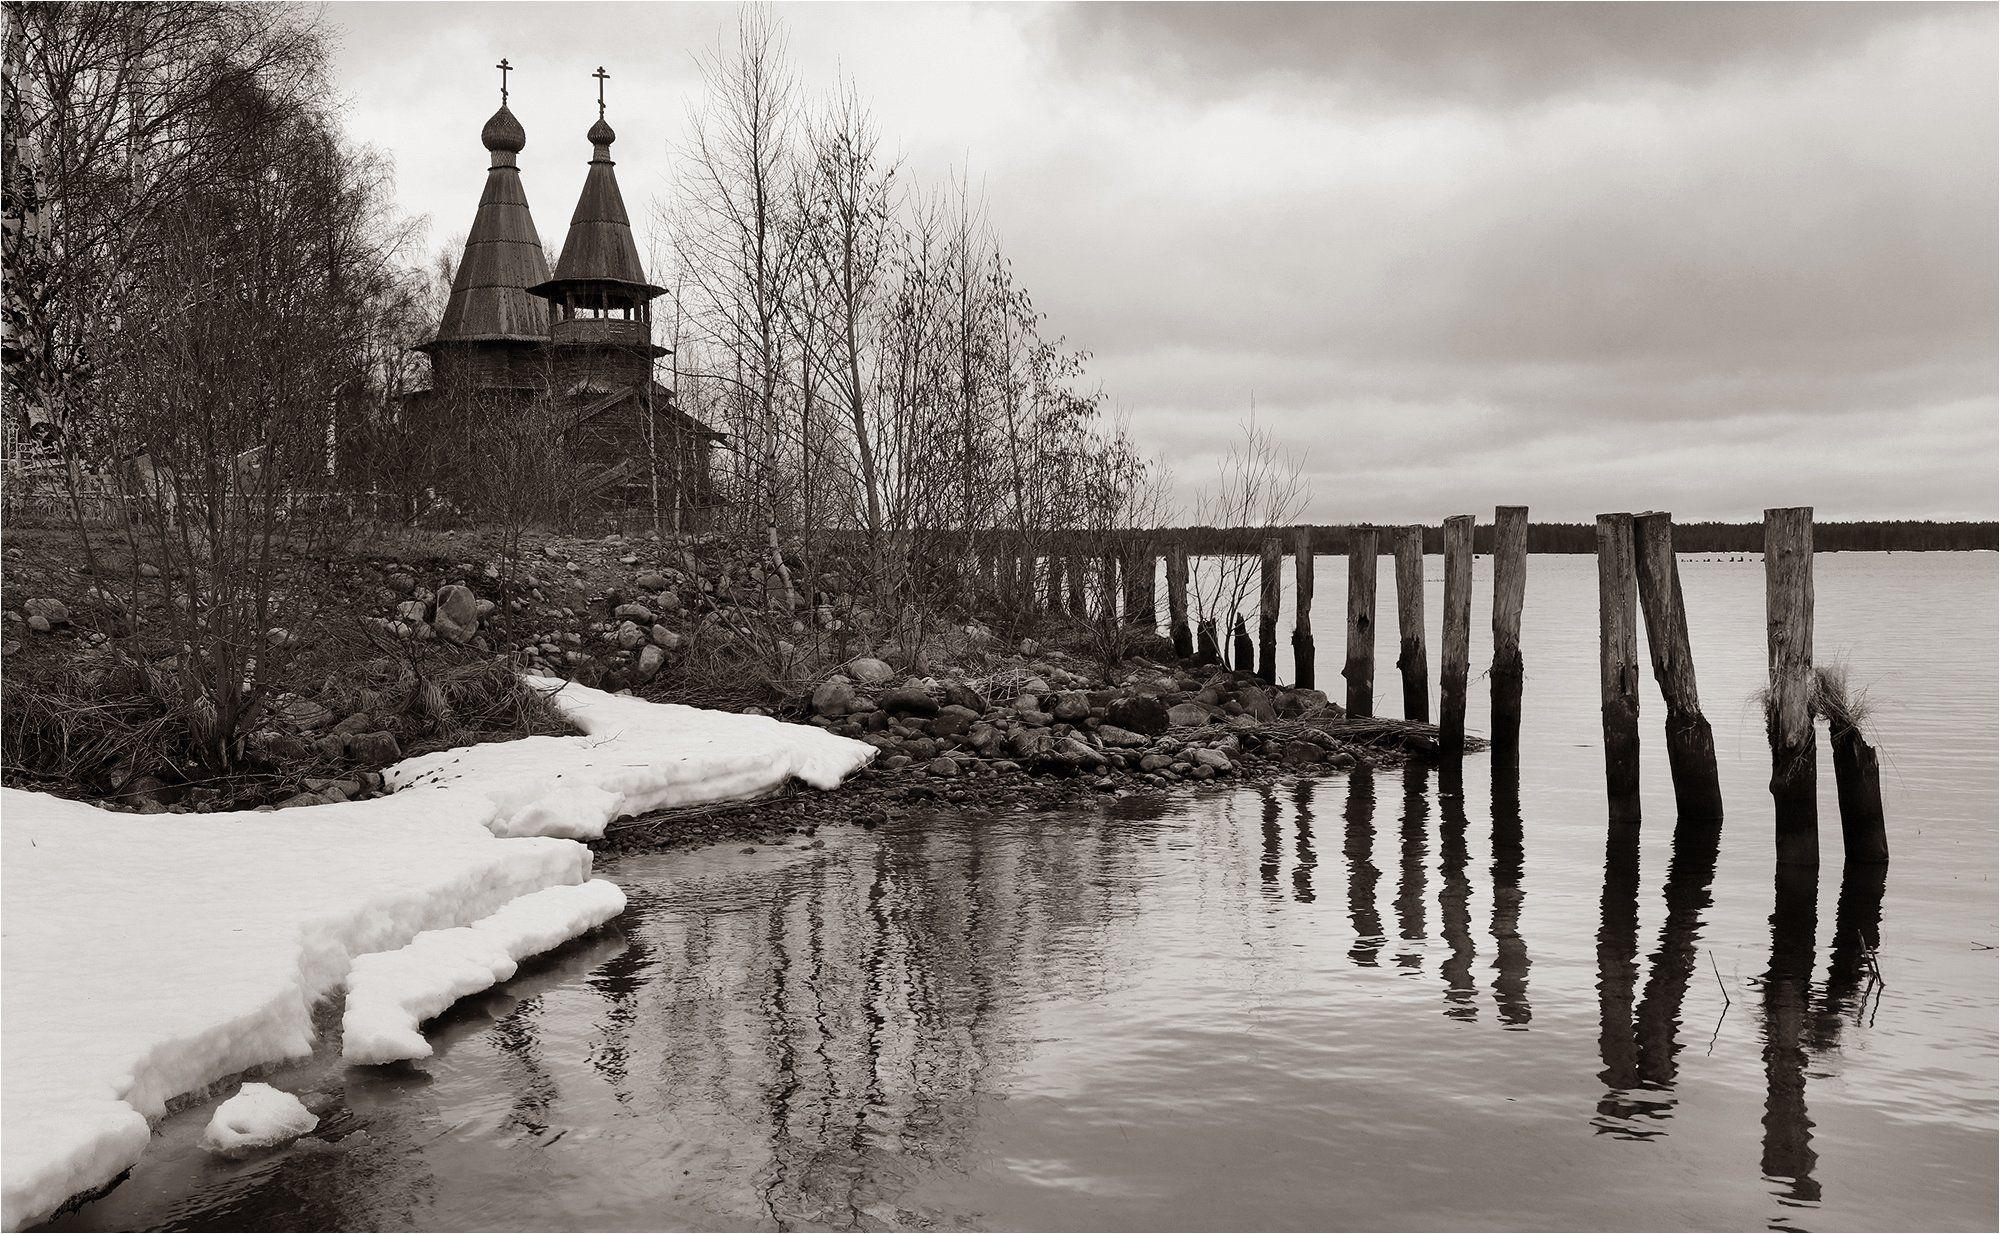 весна, снег, озеро, деревянный храм, церковь, сепия,, Victor Pechenev